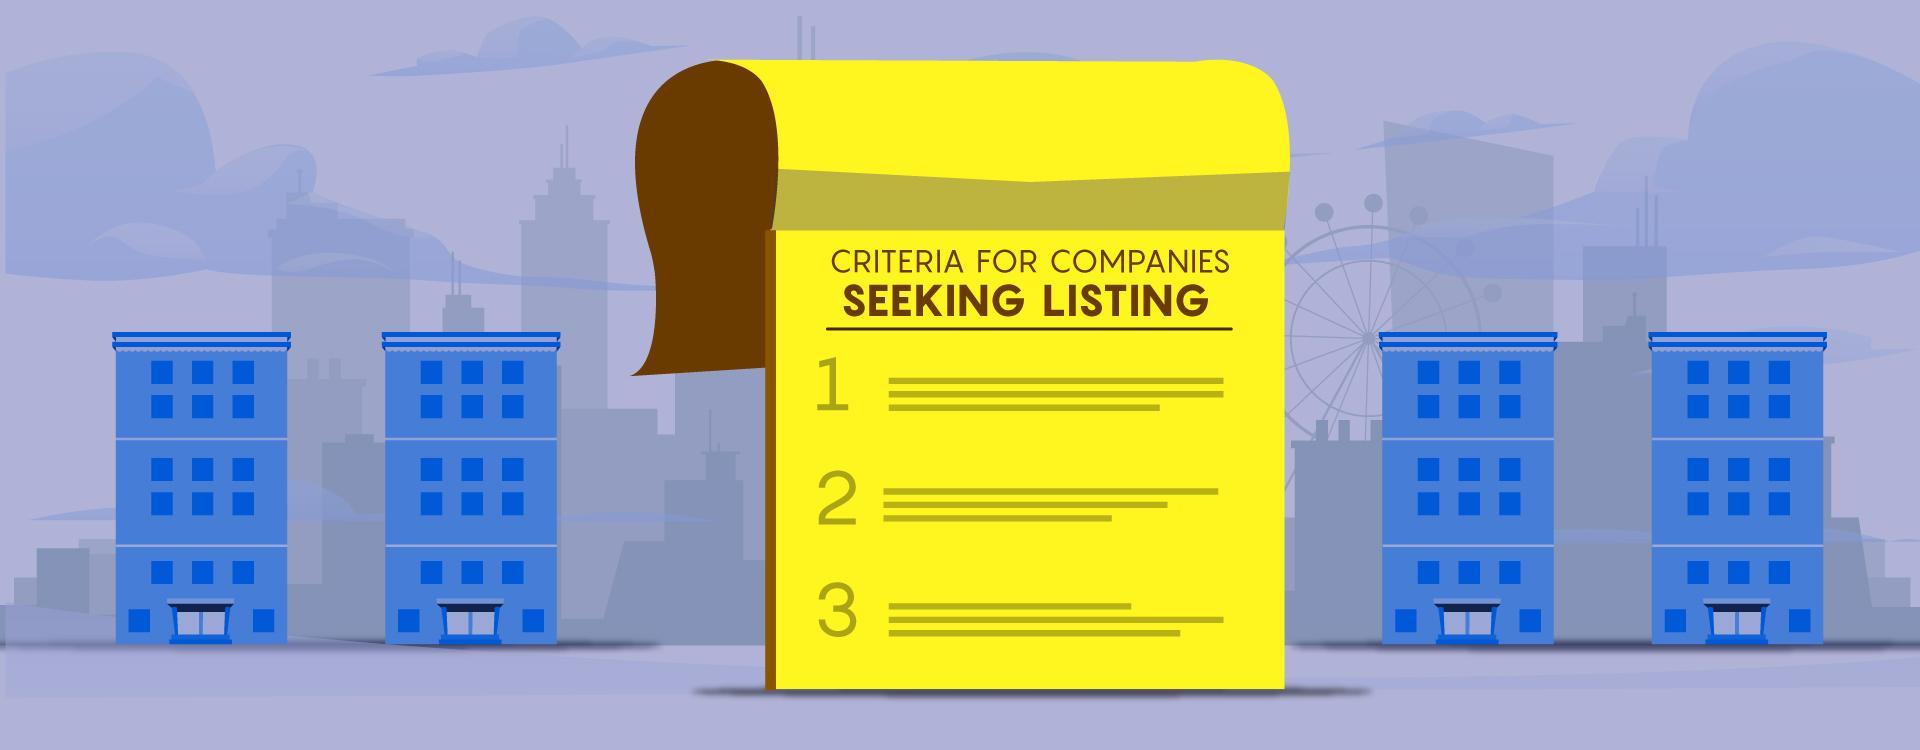 Criteria for Startups Seeking Listing